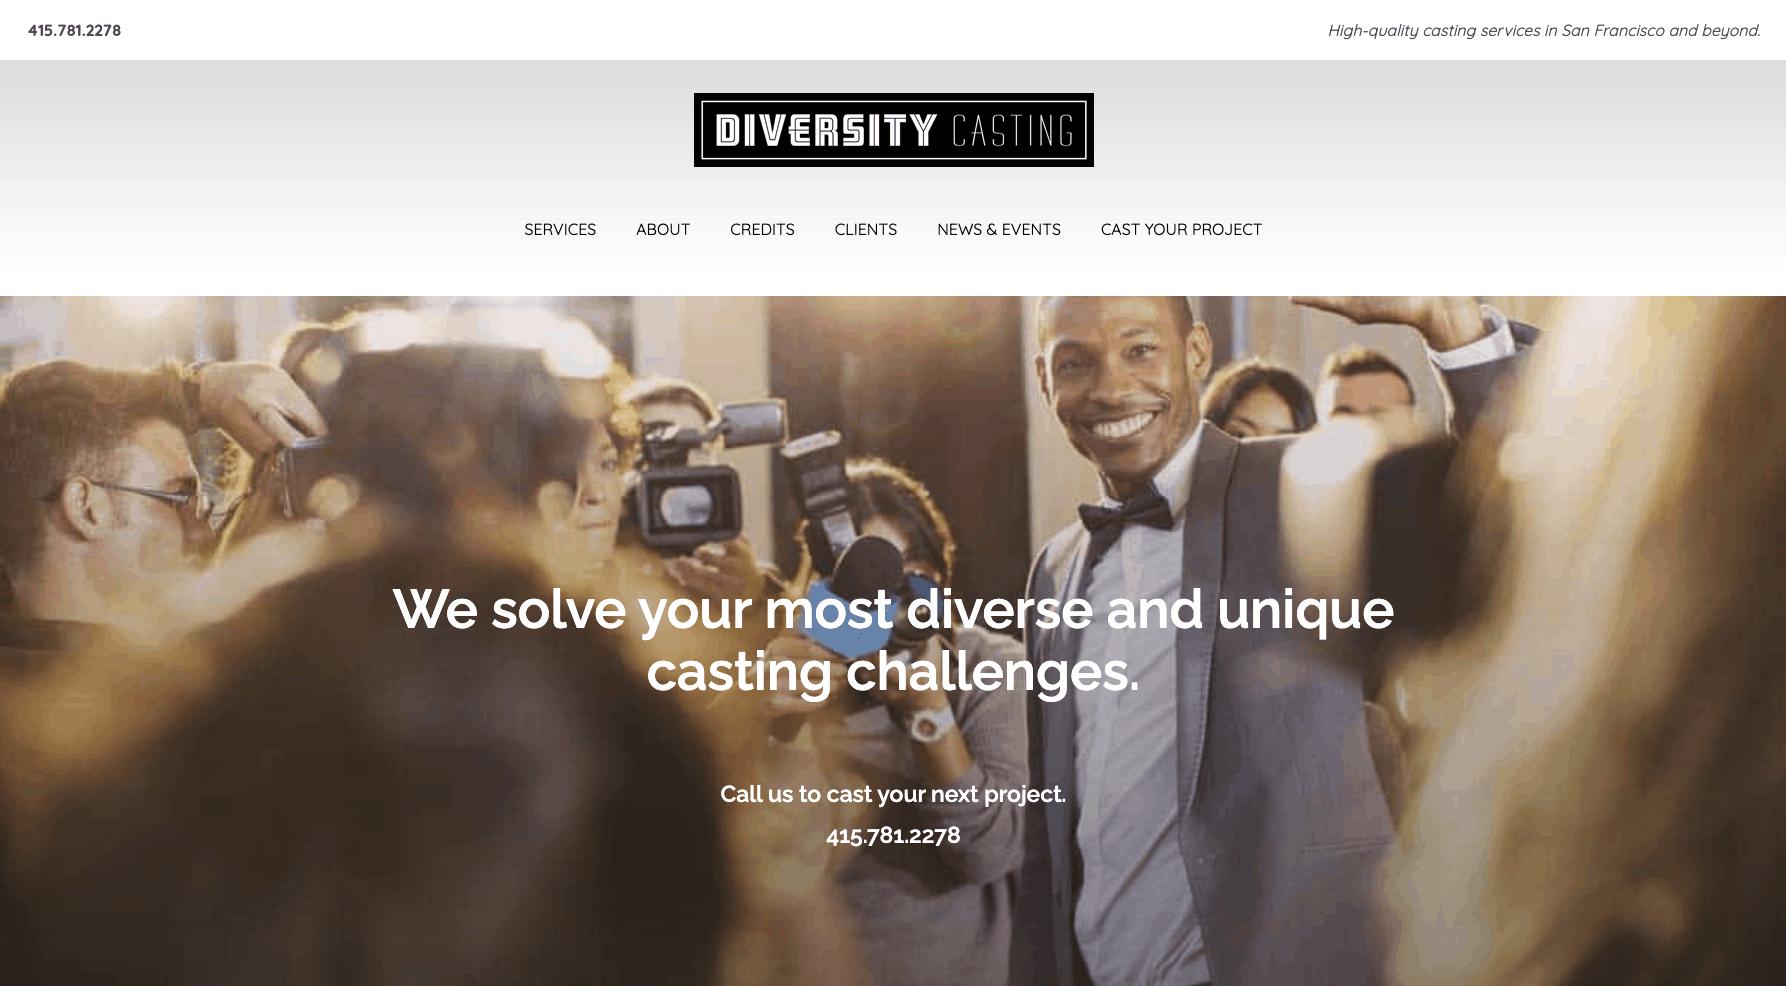 Diversity Casting